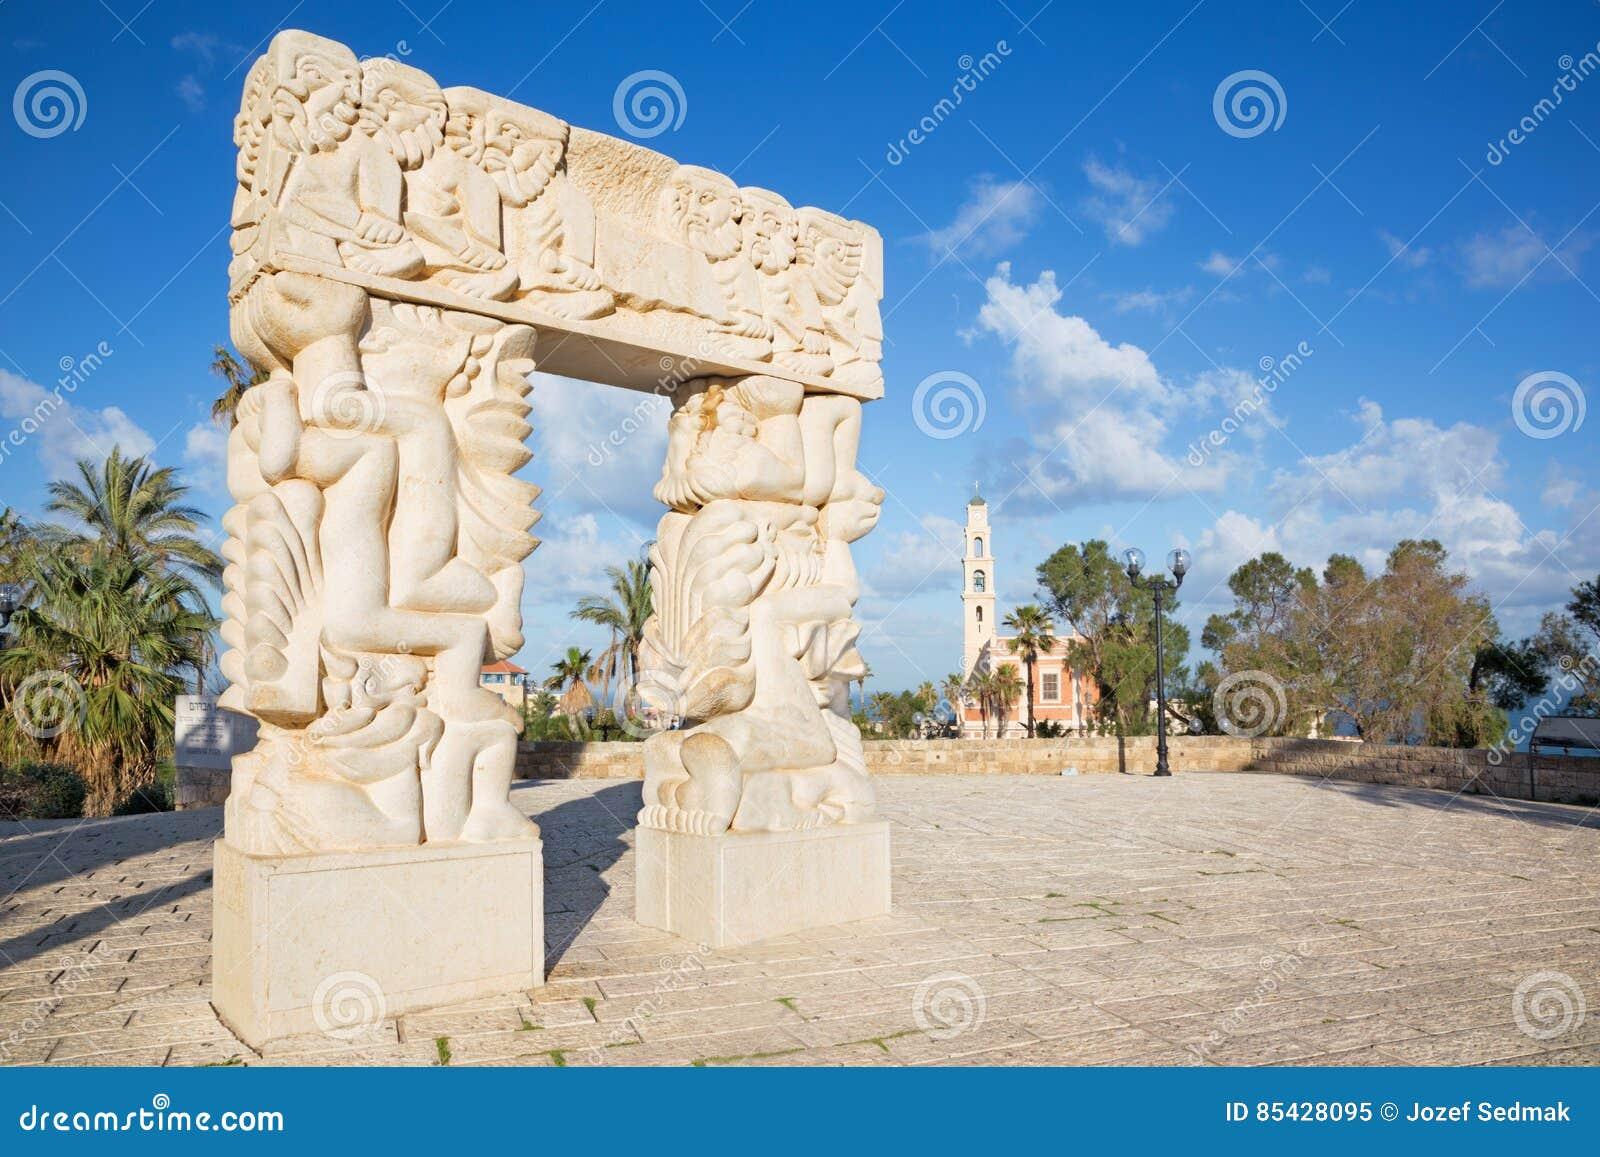 Tel Aviv - la statue contemporaine moderne de ` de sculpture de la foi en Gan HaPisga Summit Garden